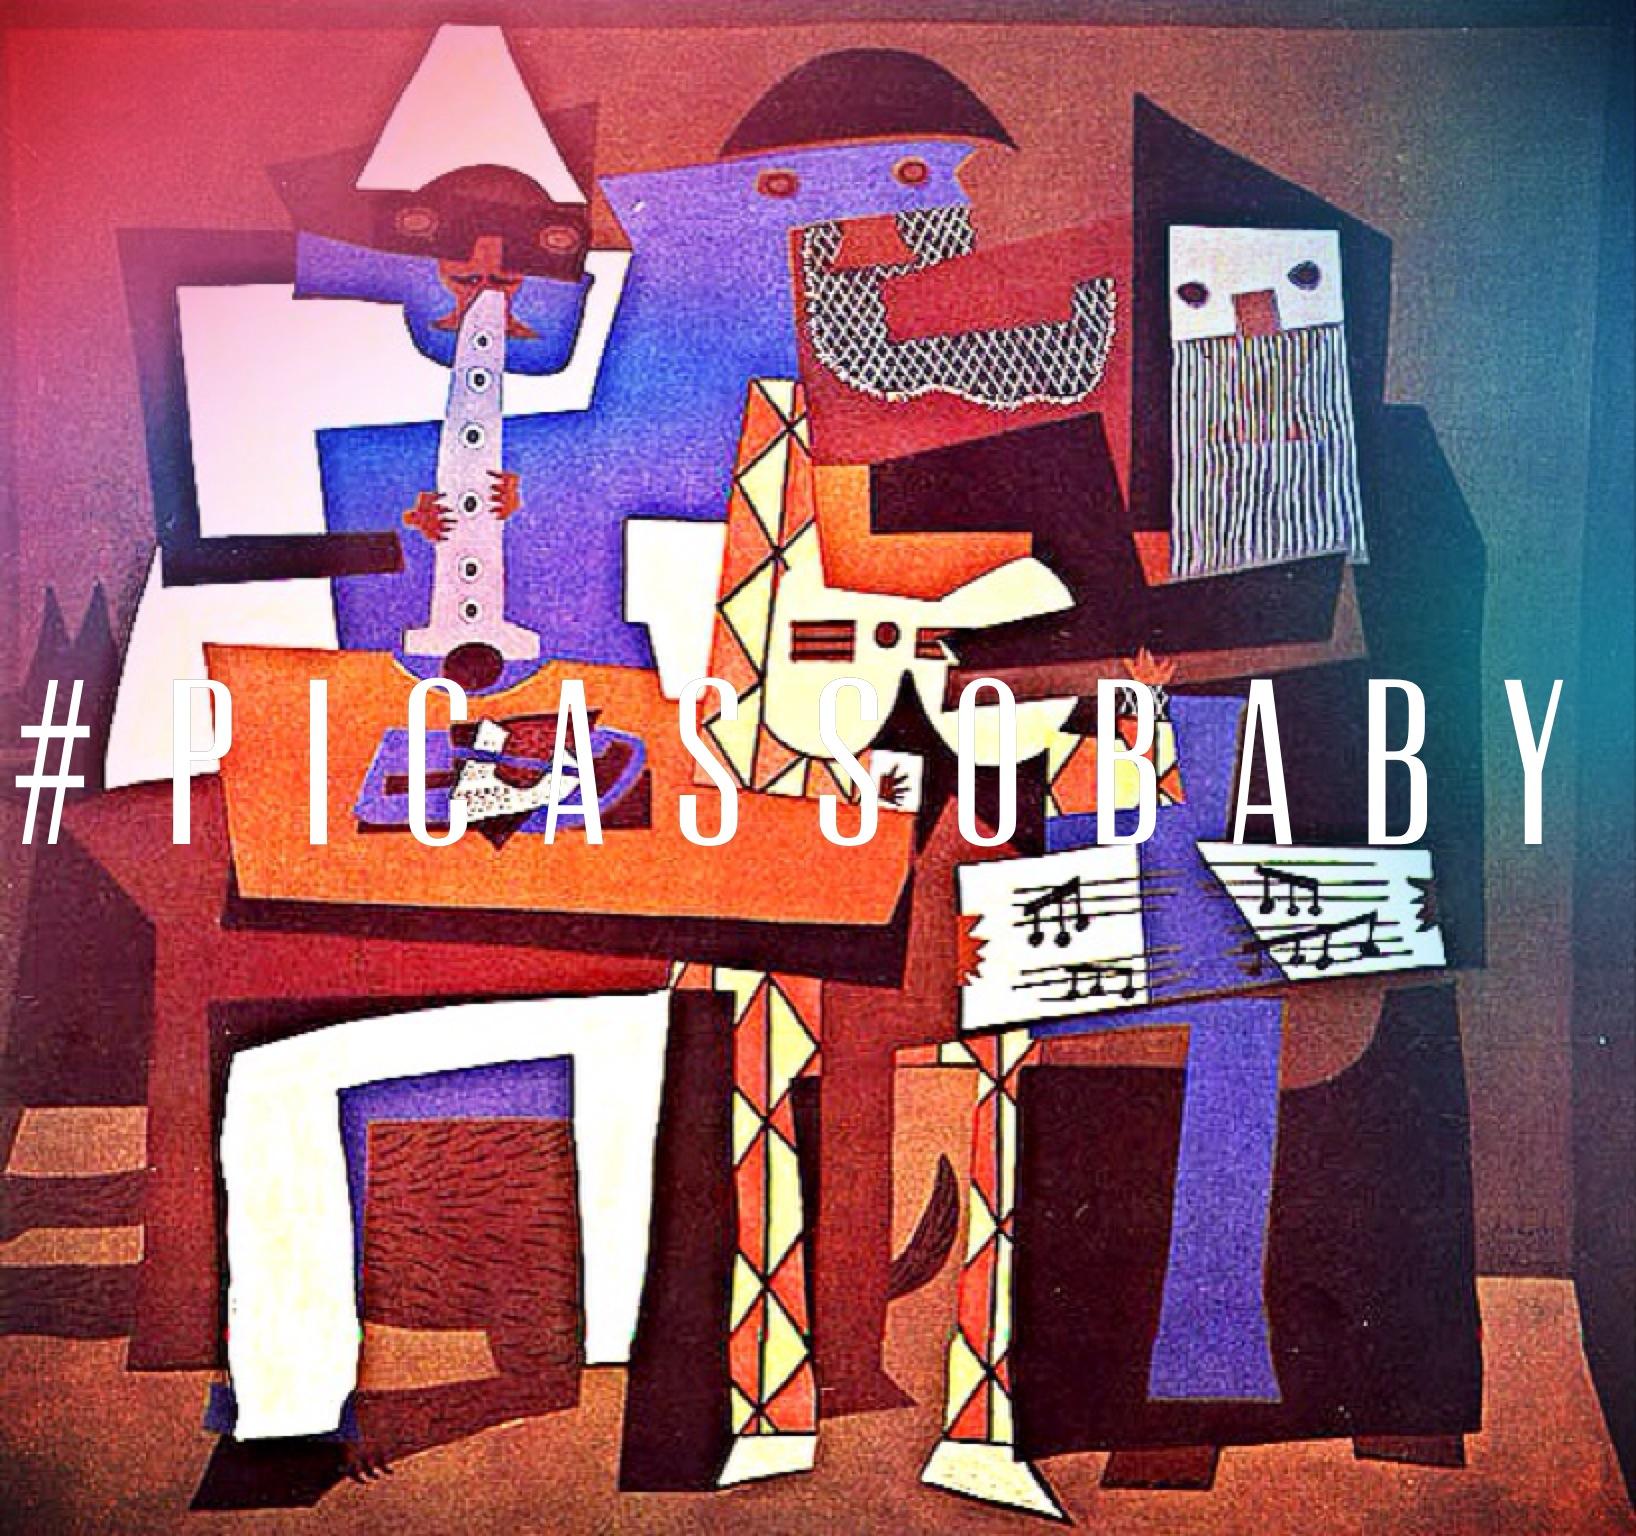 Luchi – Picasso